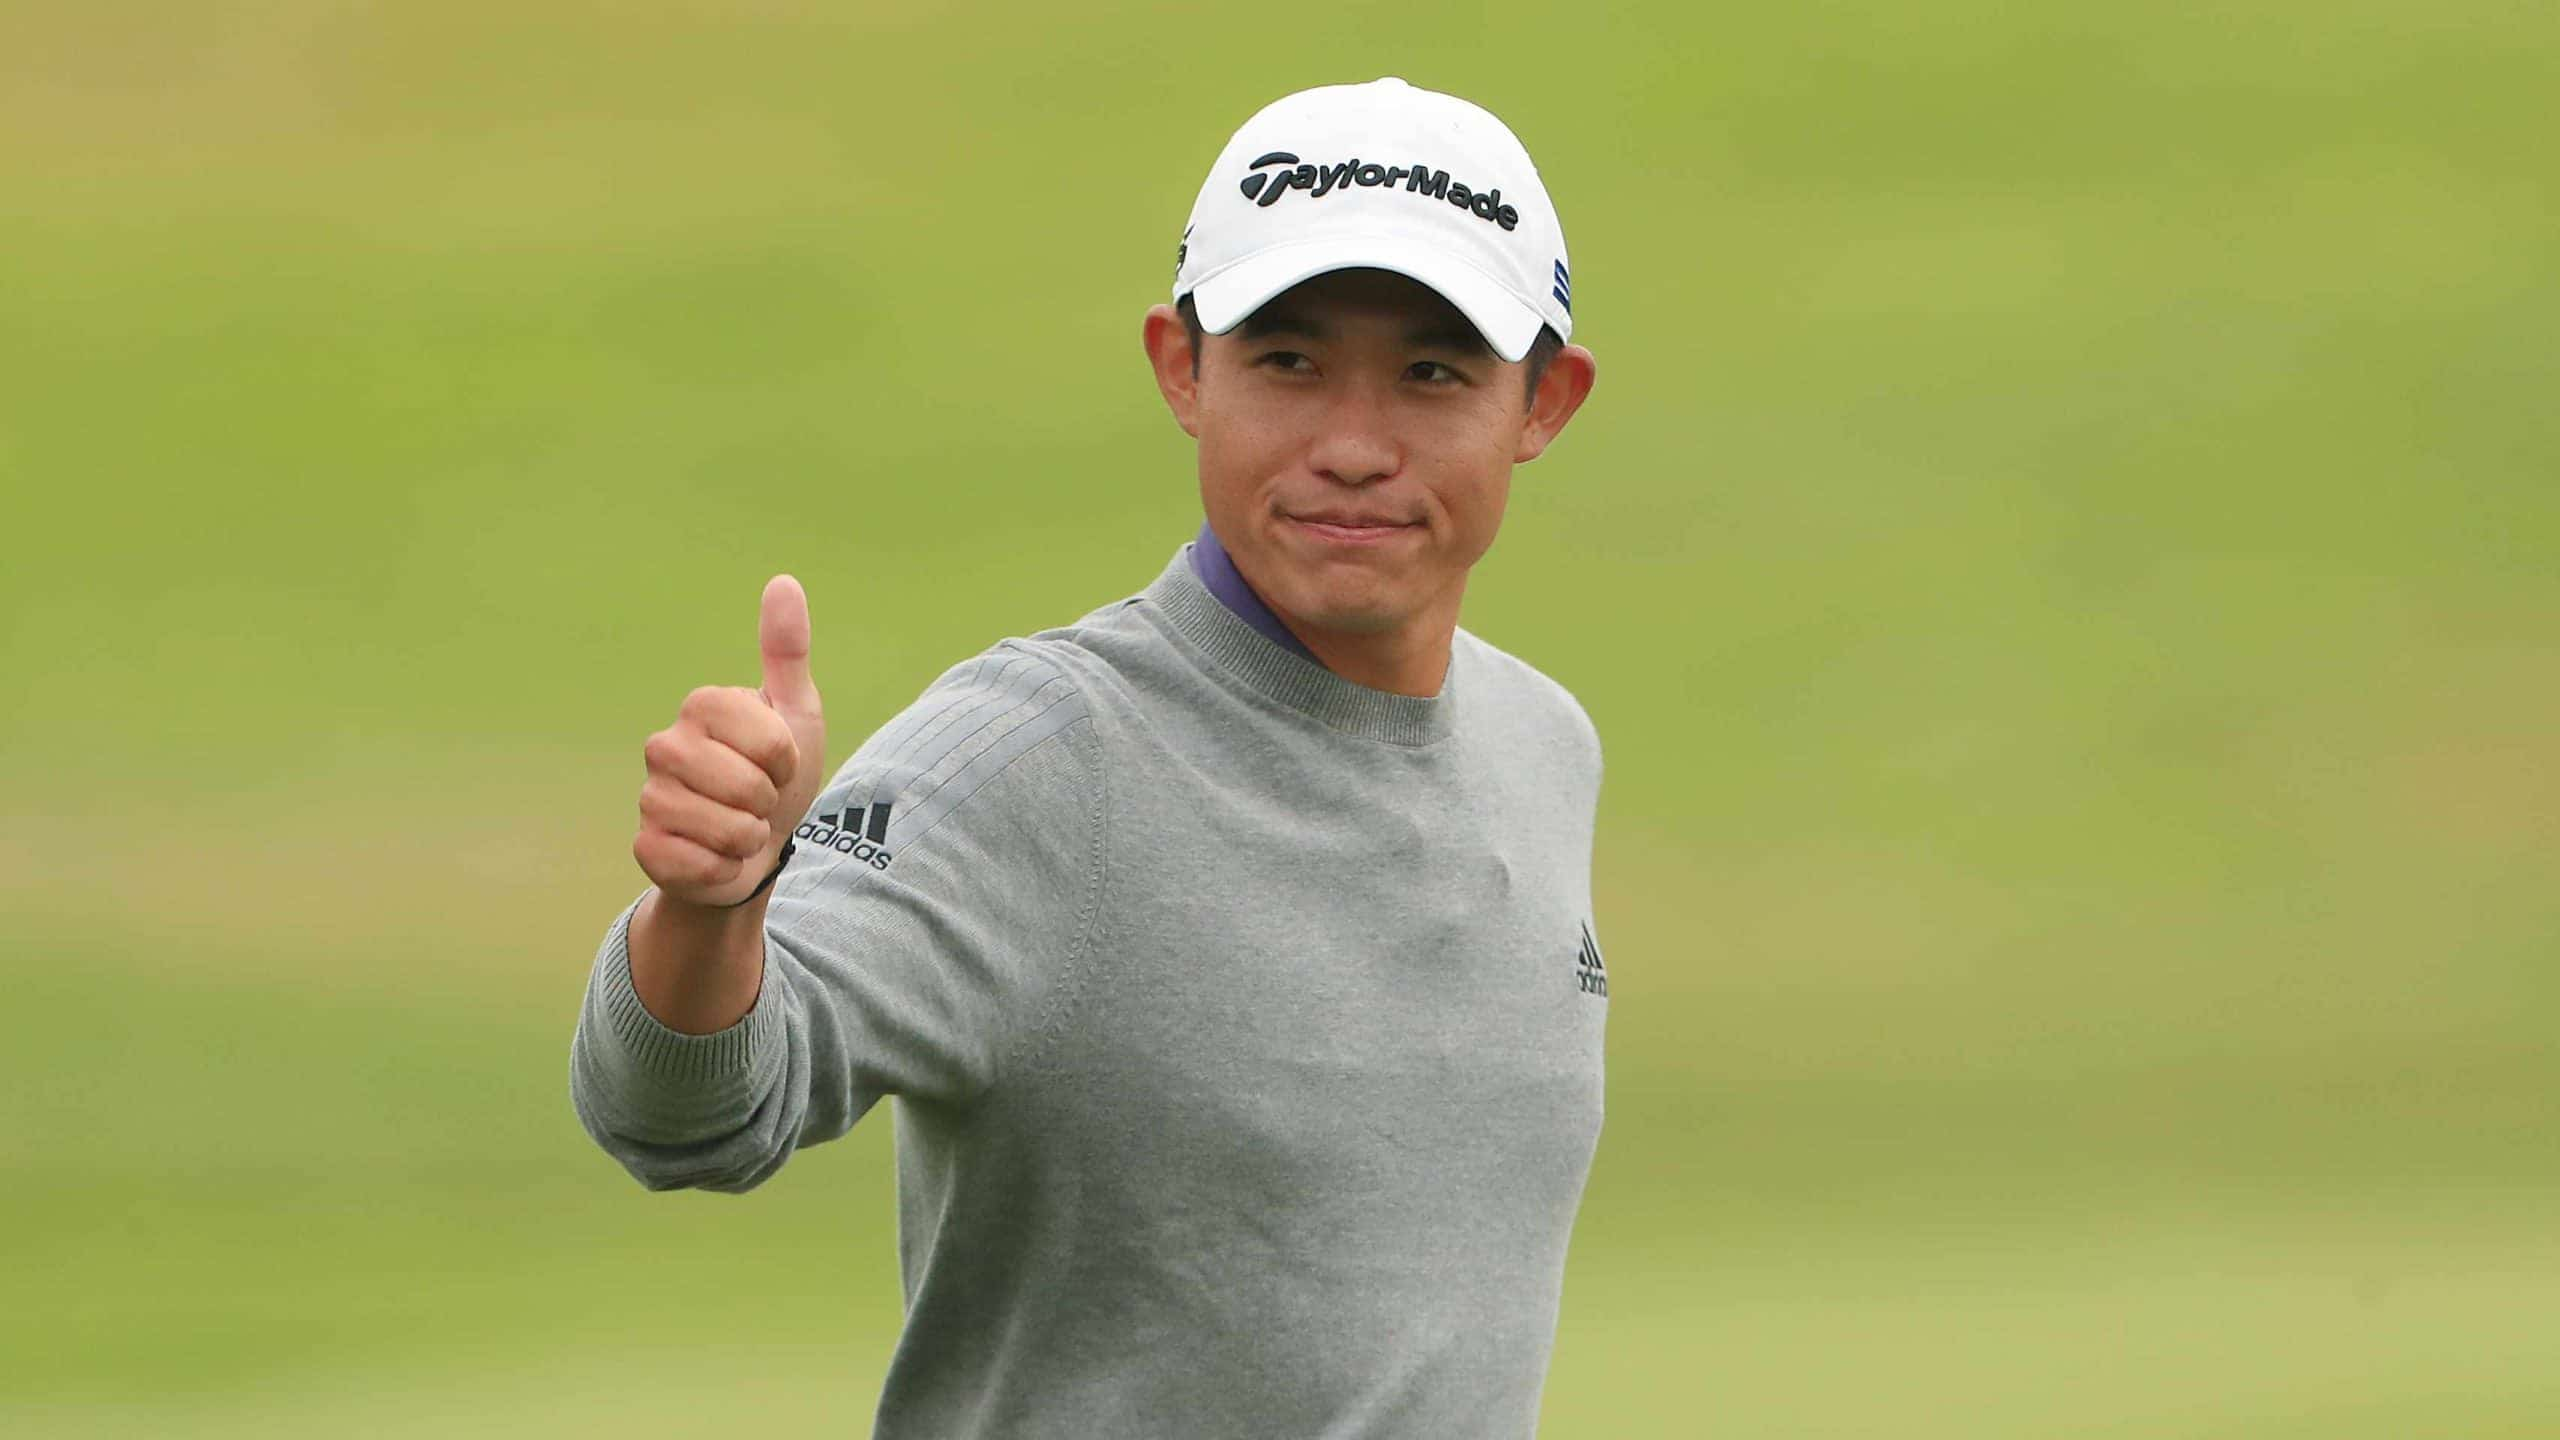 British Open 2021 winner collin morikawa